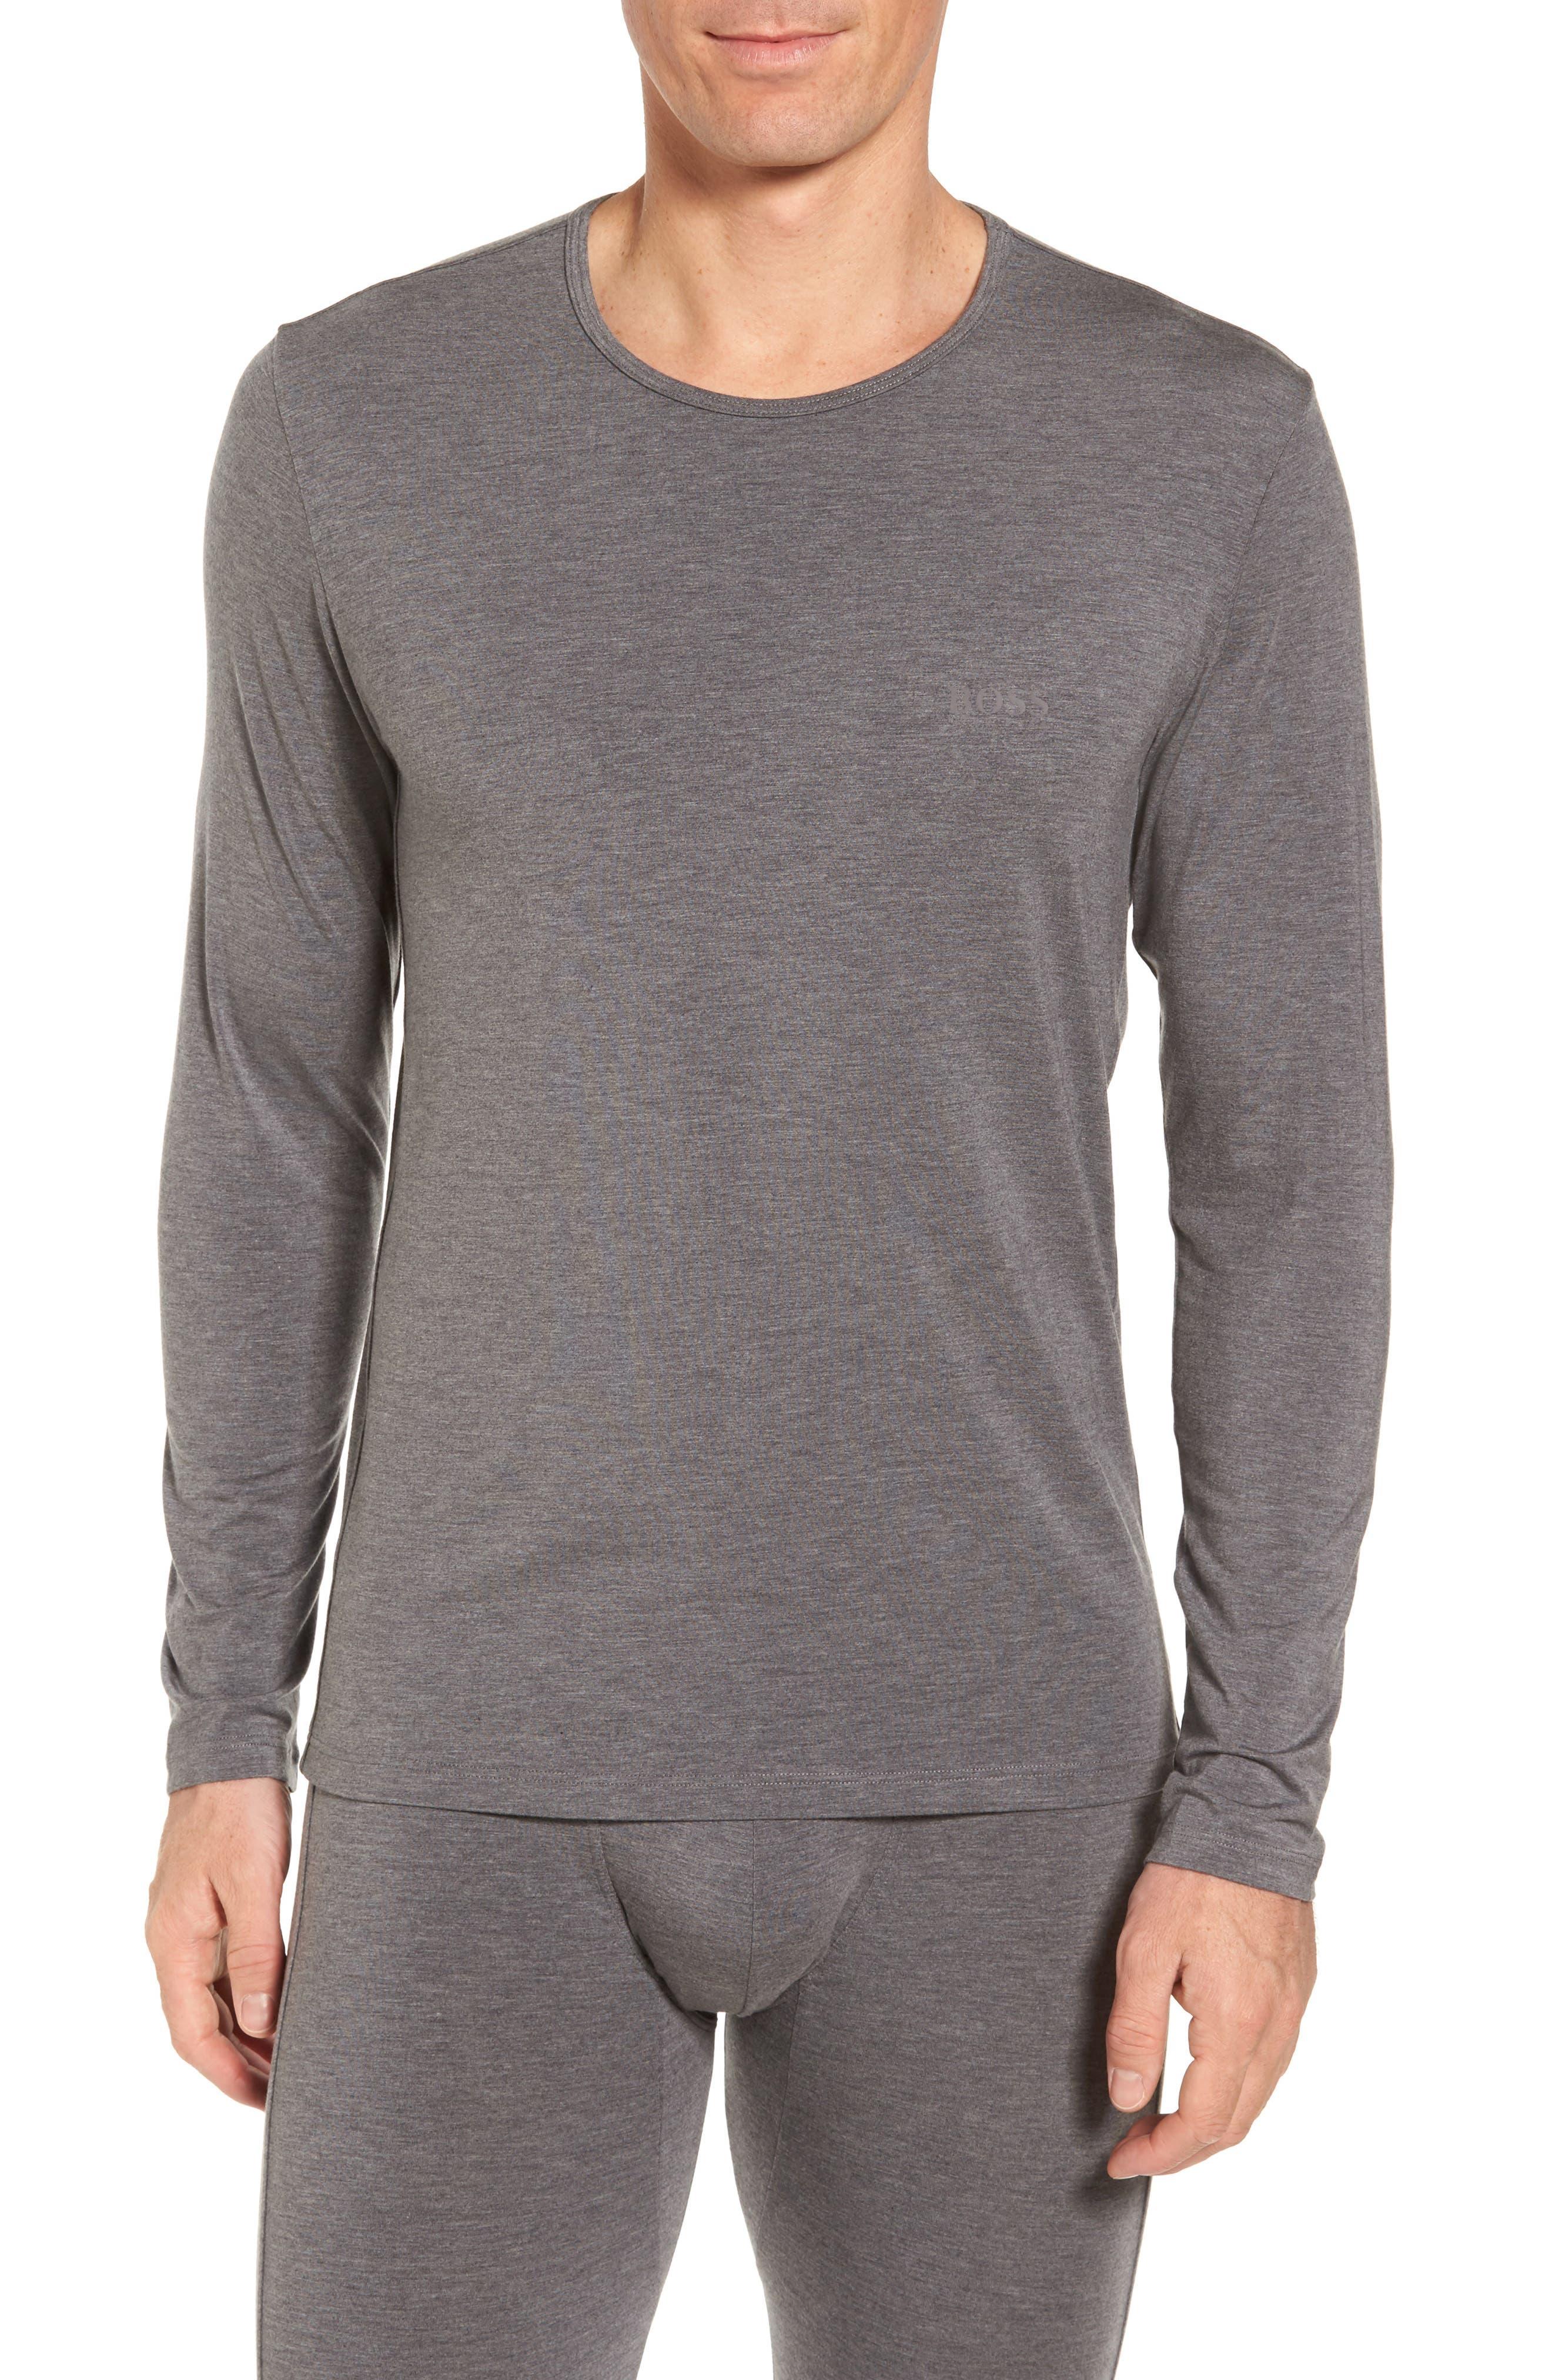 Thermal Long Sleeve T-Shirt,                         Main,                         color, 020